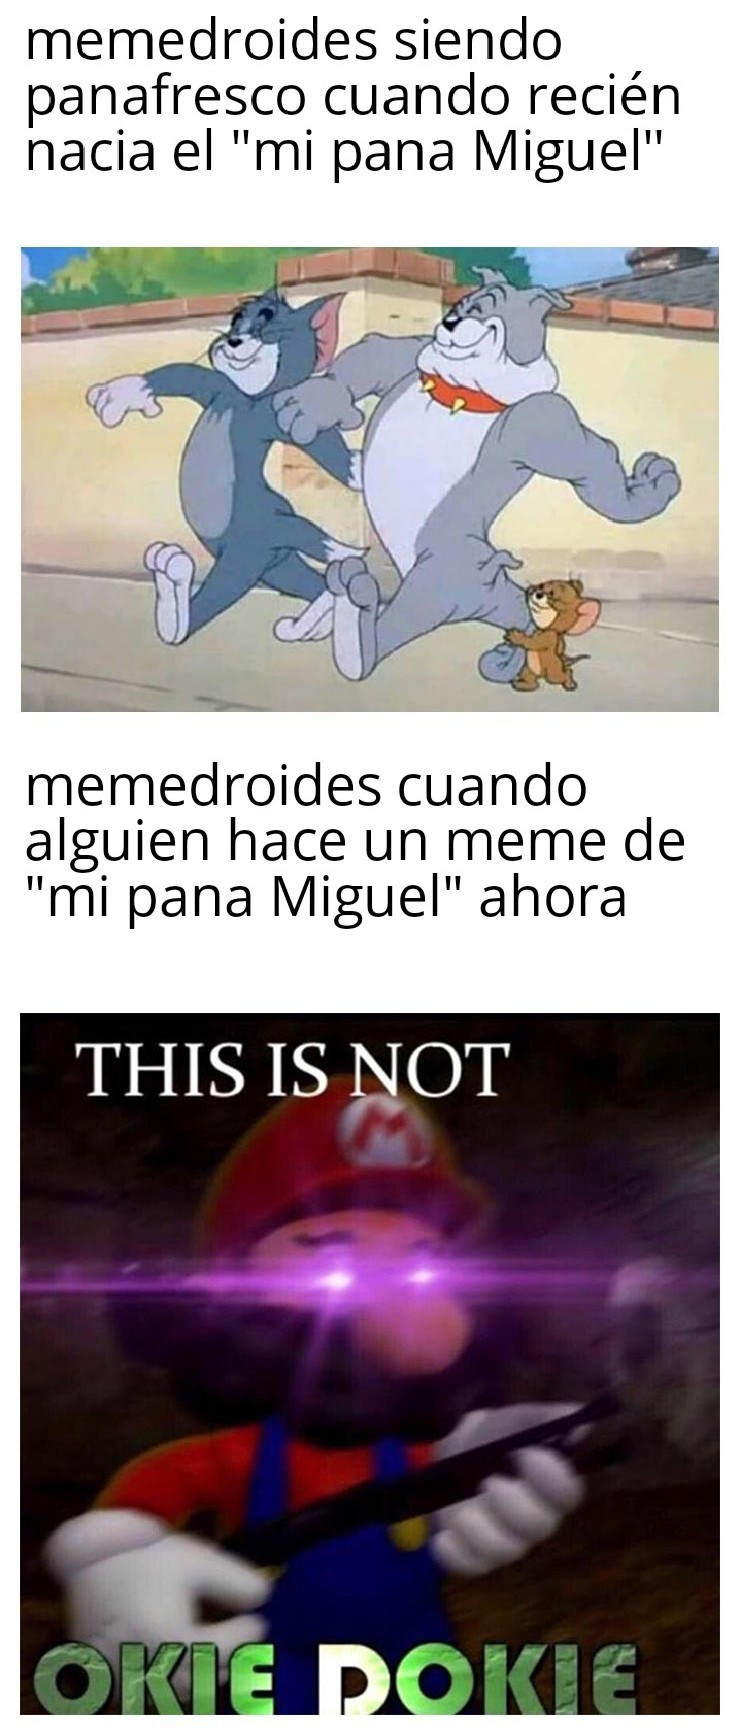 Díganle no a los pañalfrescos - meme